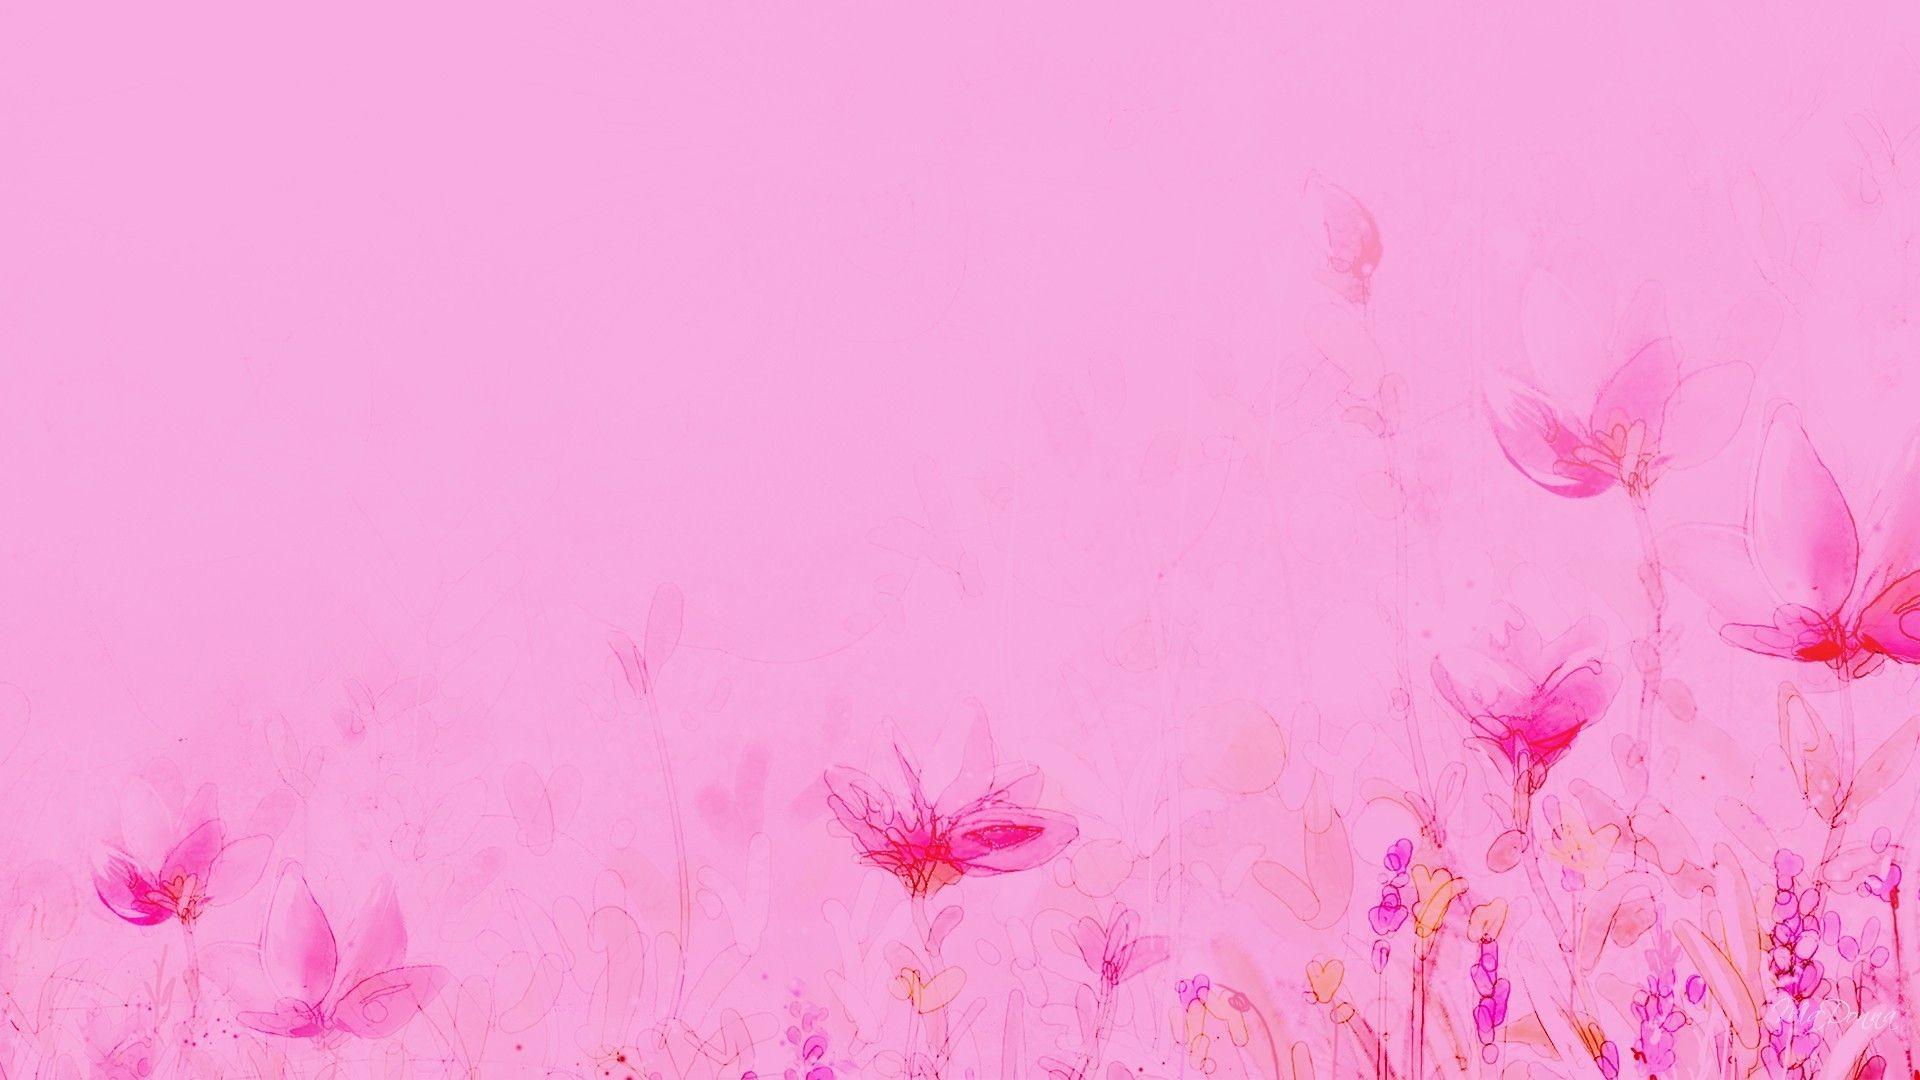 Res: 1920x1080, Light Pink Wallpapers Desktop Backgrounds